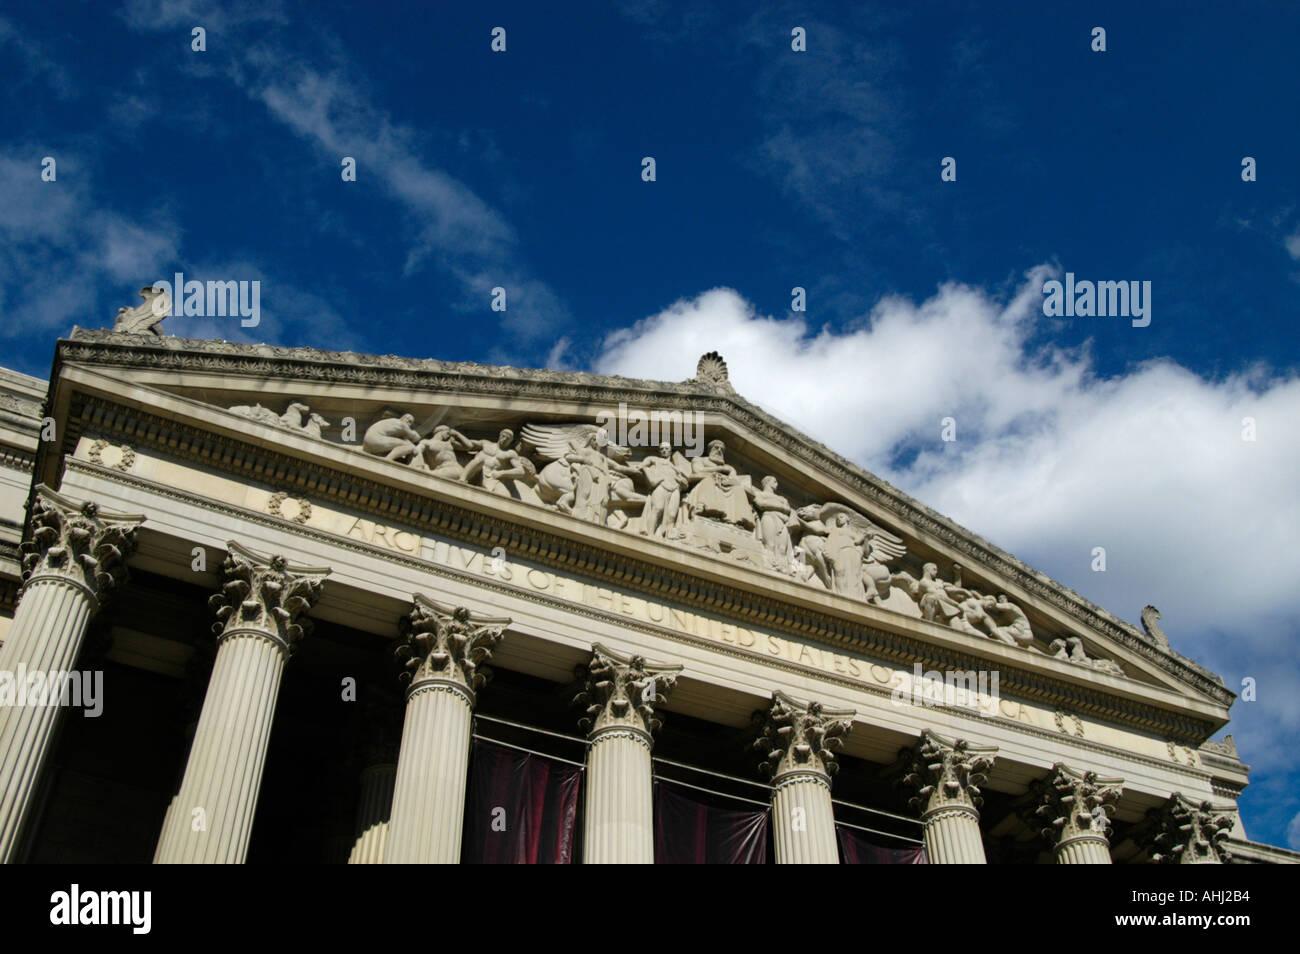 Archives of the United States of America, Washington DC USA - Stock Image